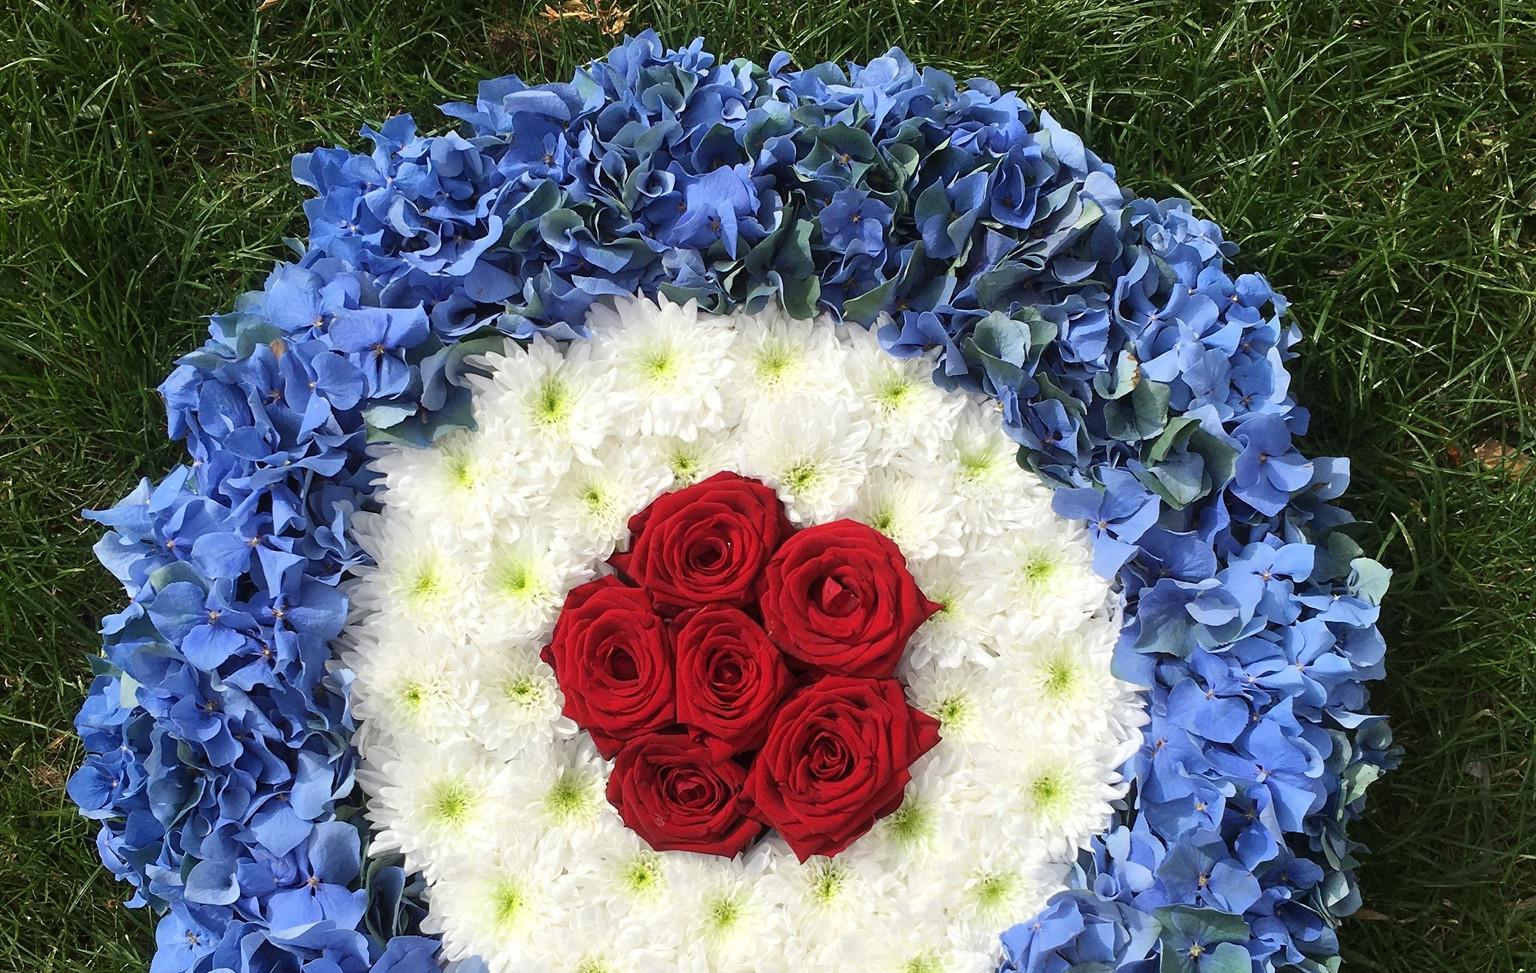 Bespoke Floral Tribute